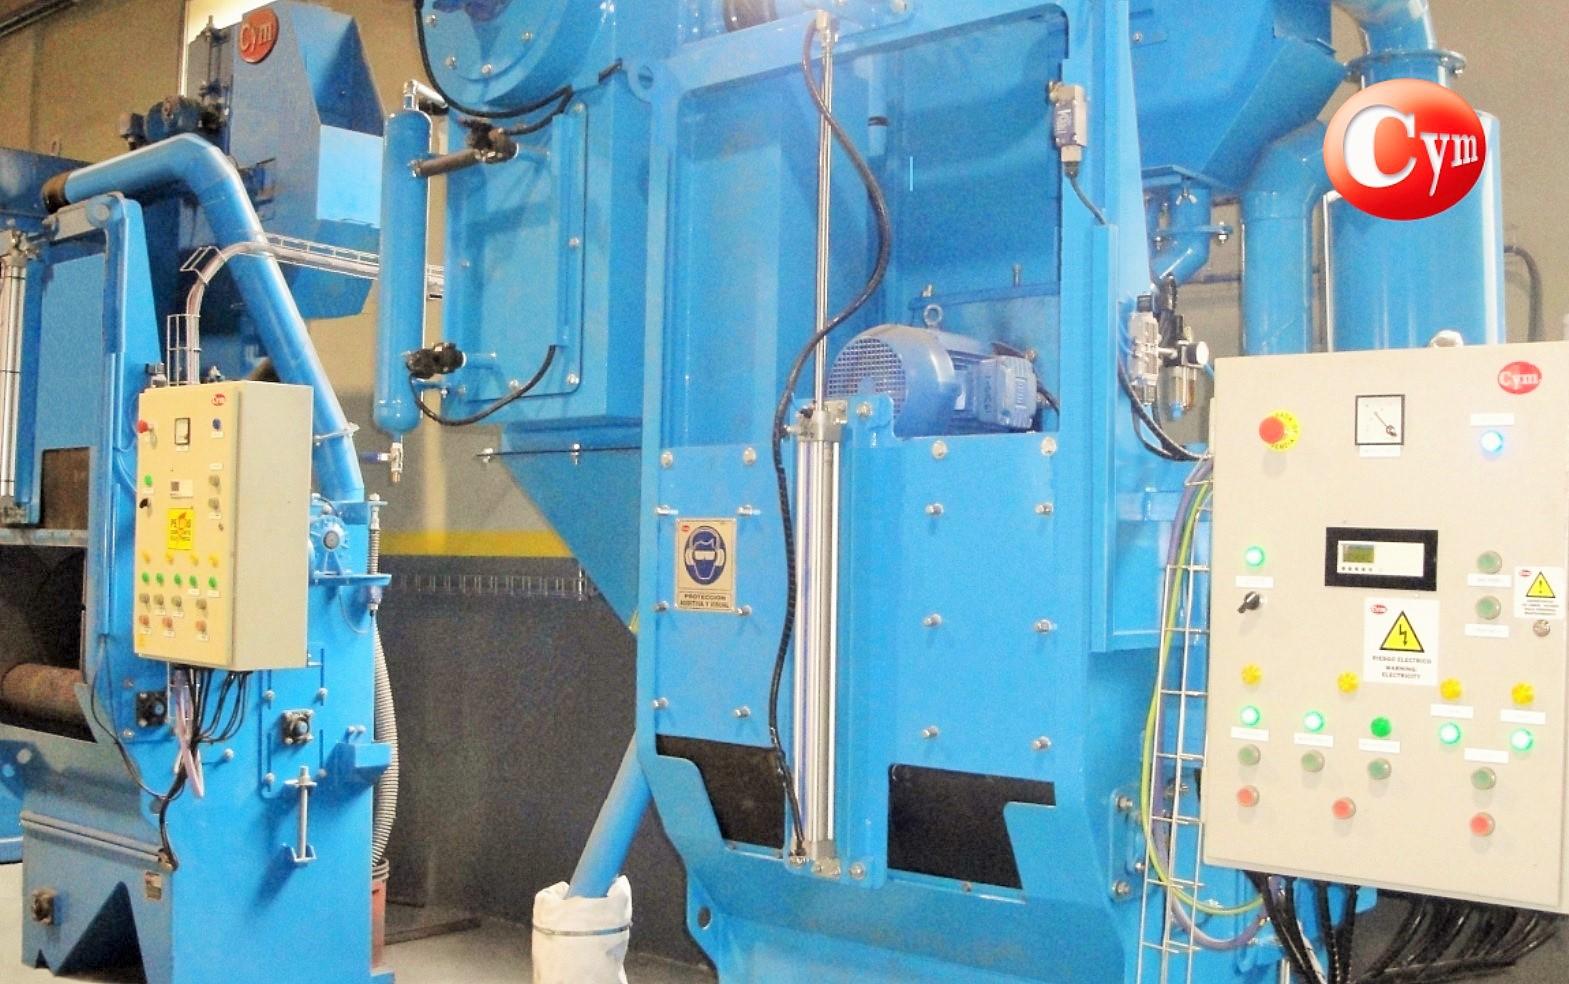 granalladora-de-cinta-rotativa-cym-lt60-wenlen-4